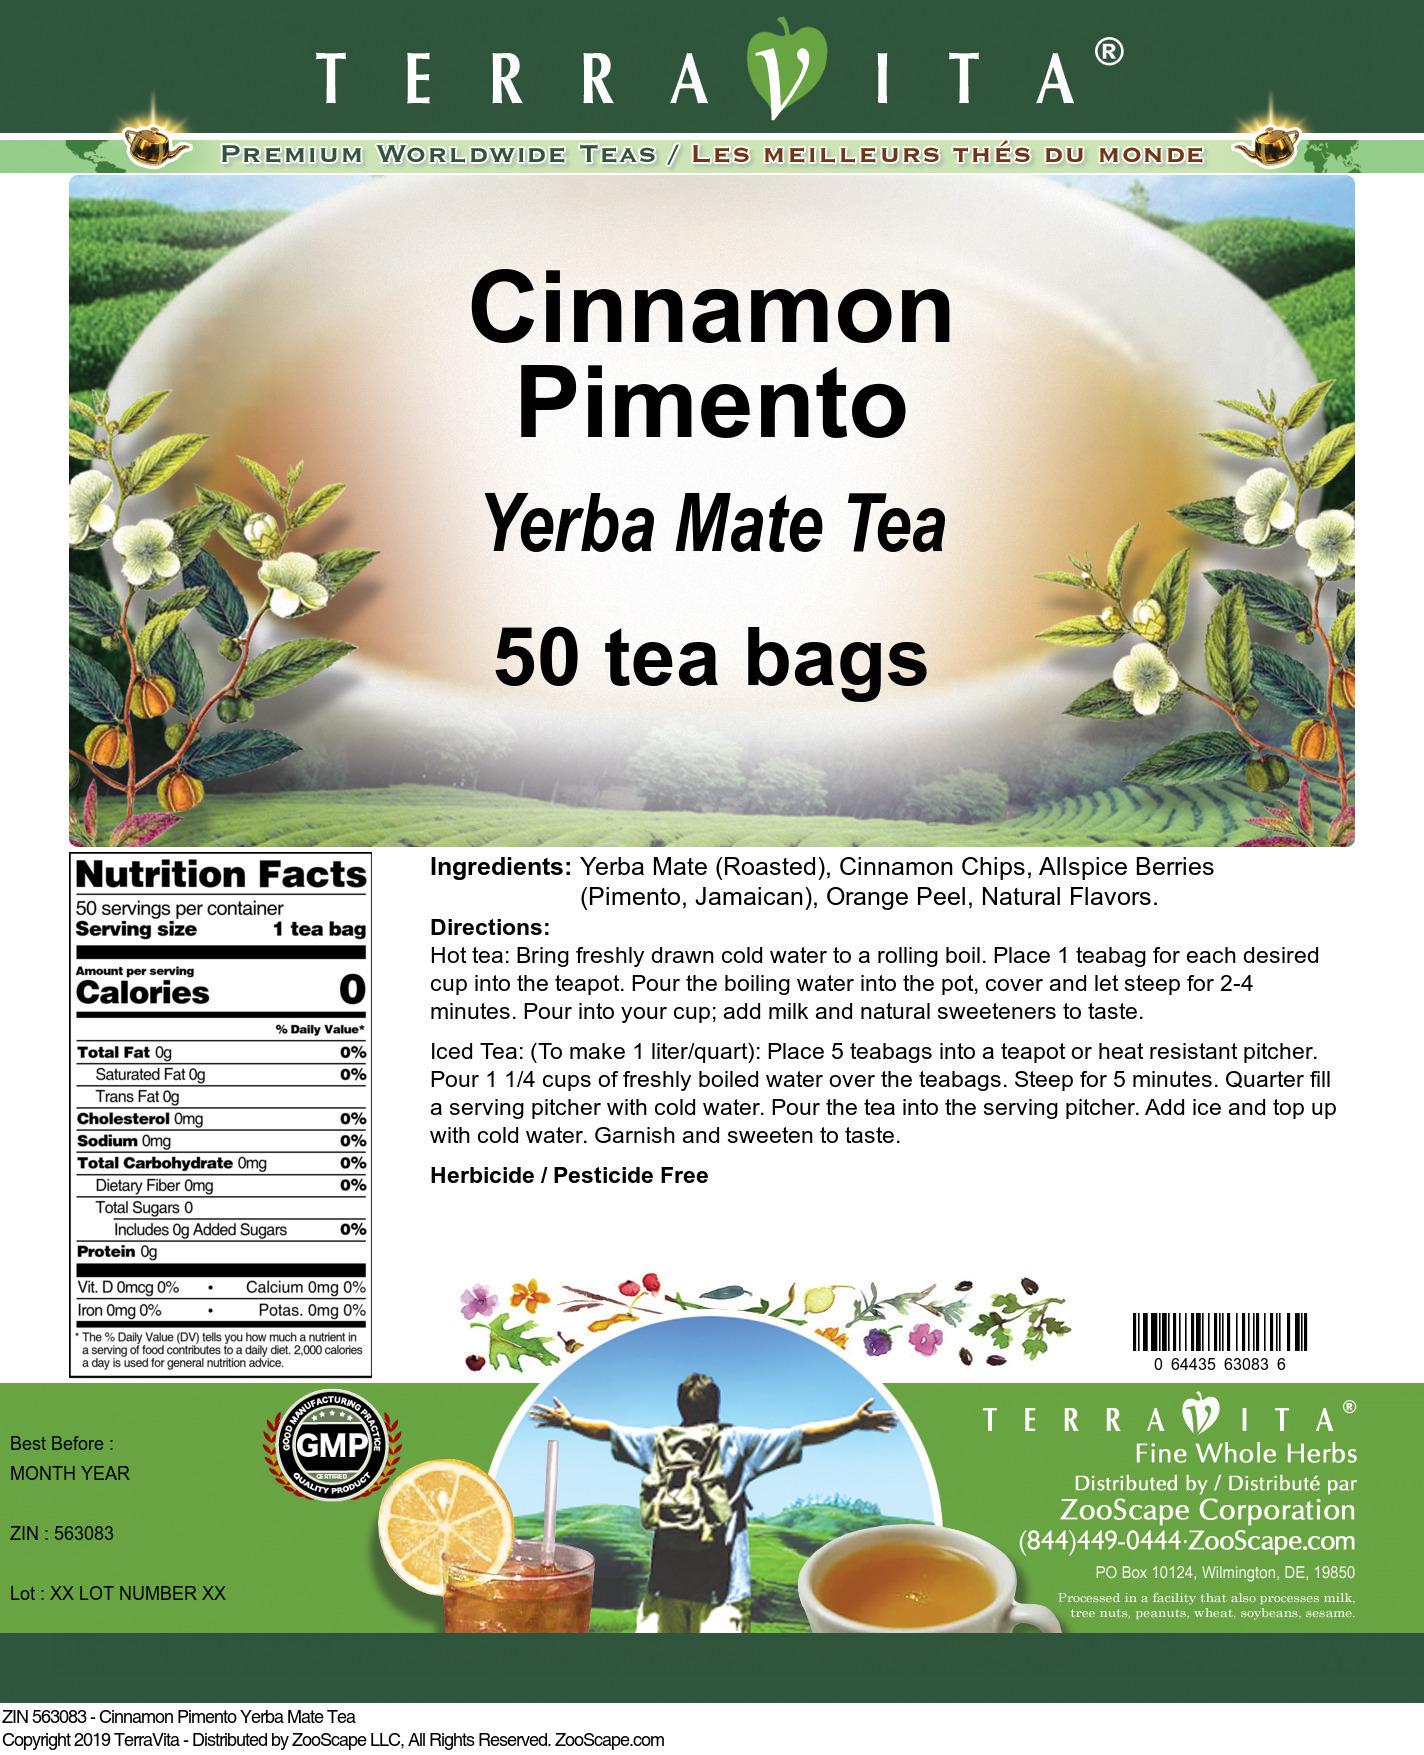 Cinnamon Pimento Yerba Mate Tea